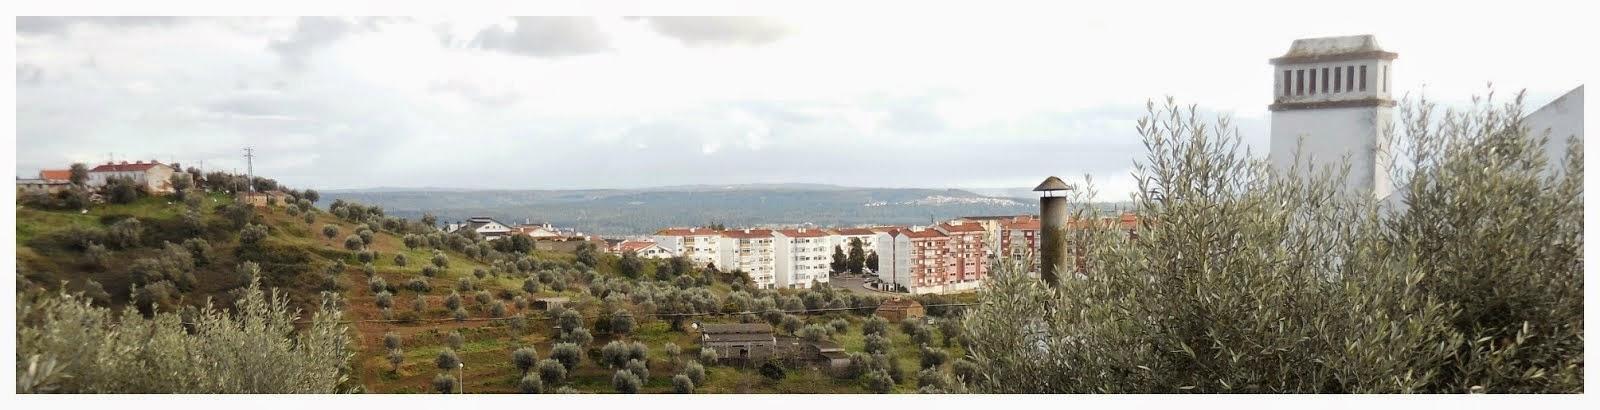 Portugal Lisbon Mission